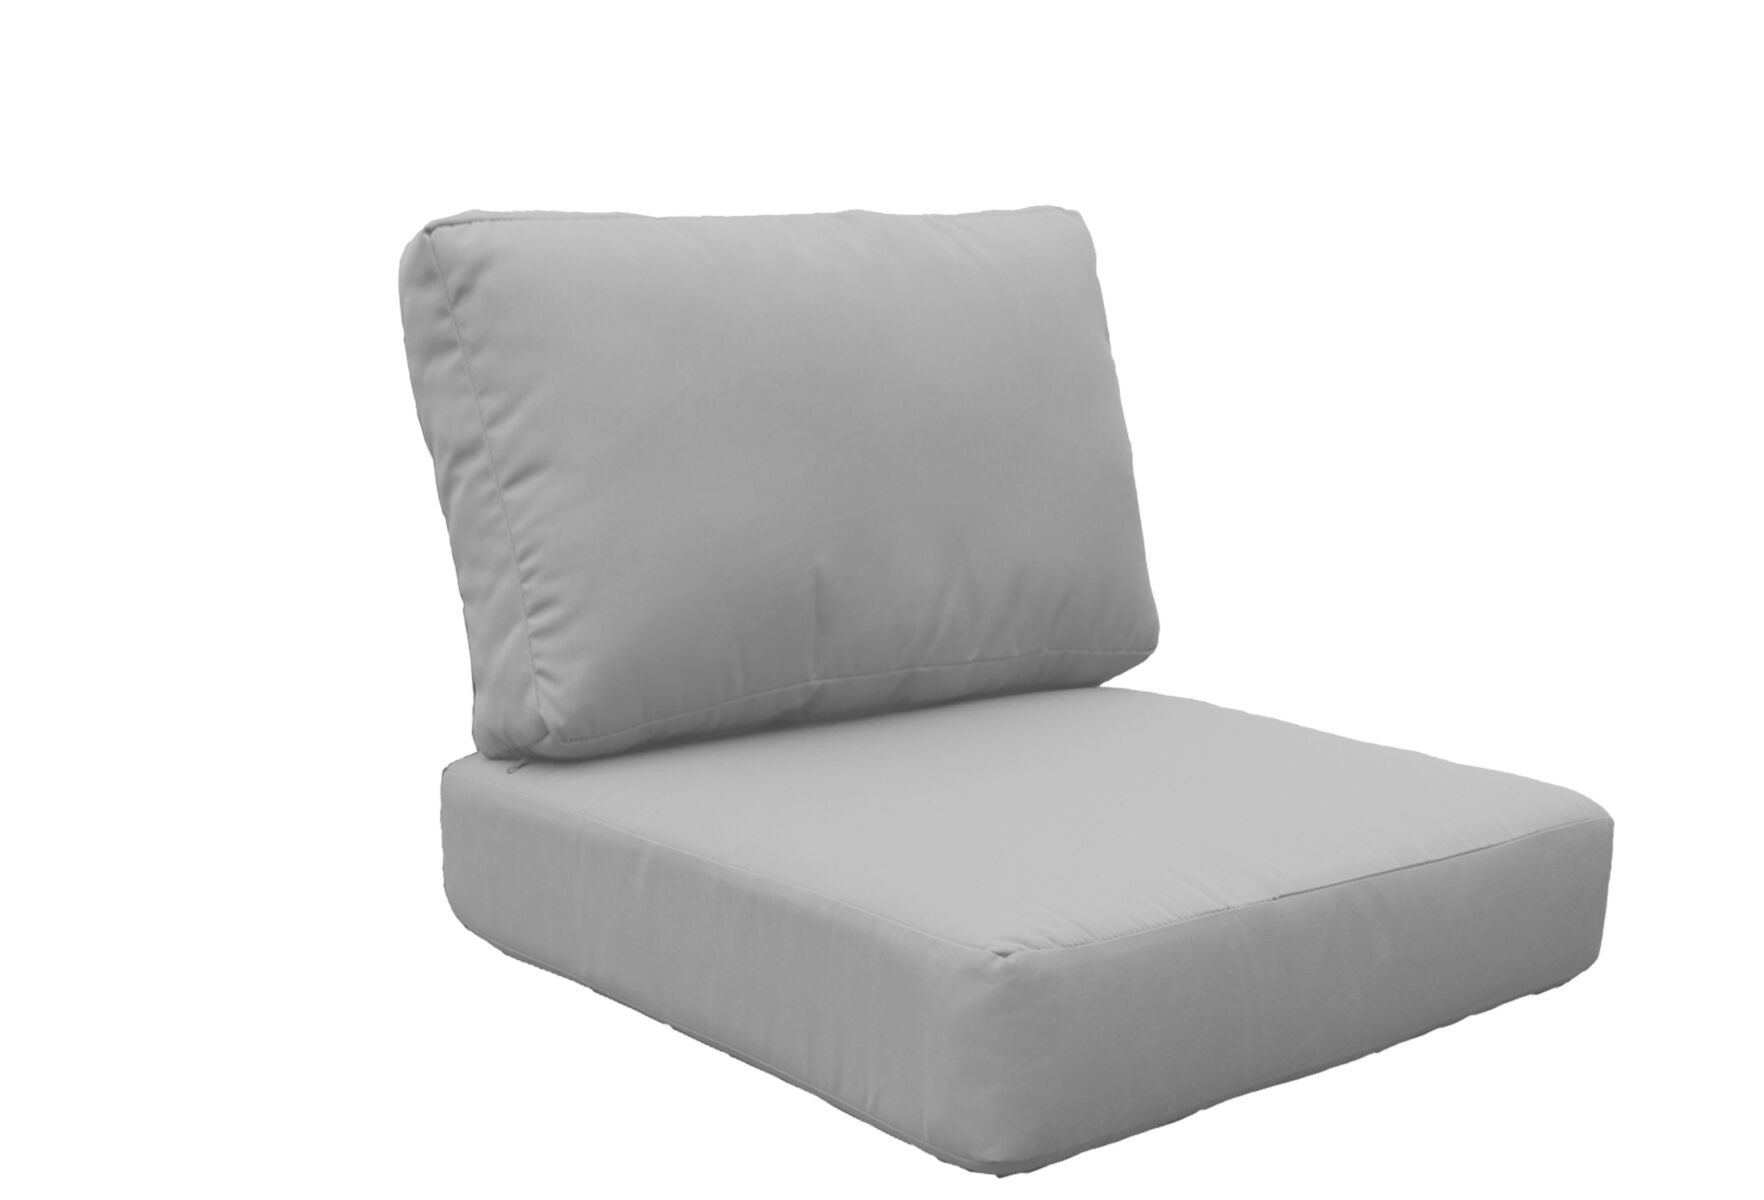 Miami 10 Piece Outdoor Lounge Chair Cushion Set Fabric: Gray